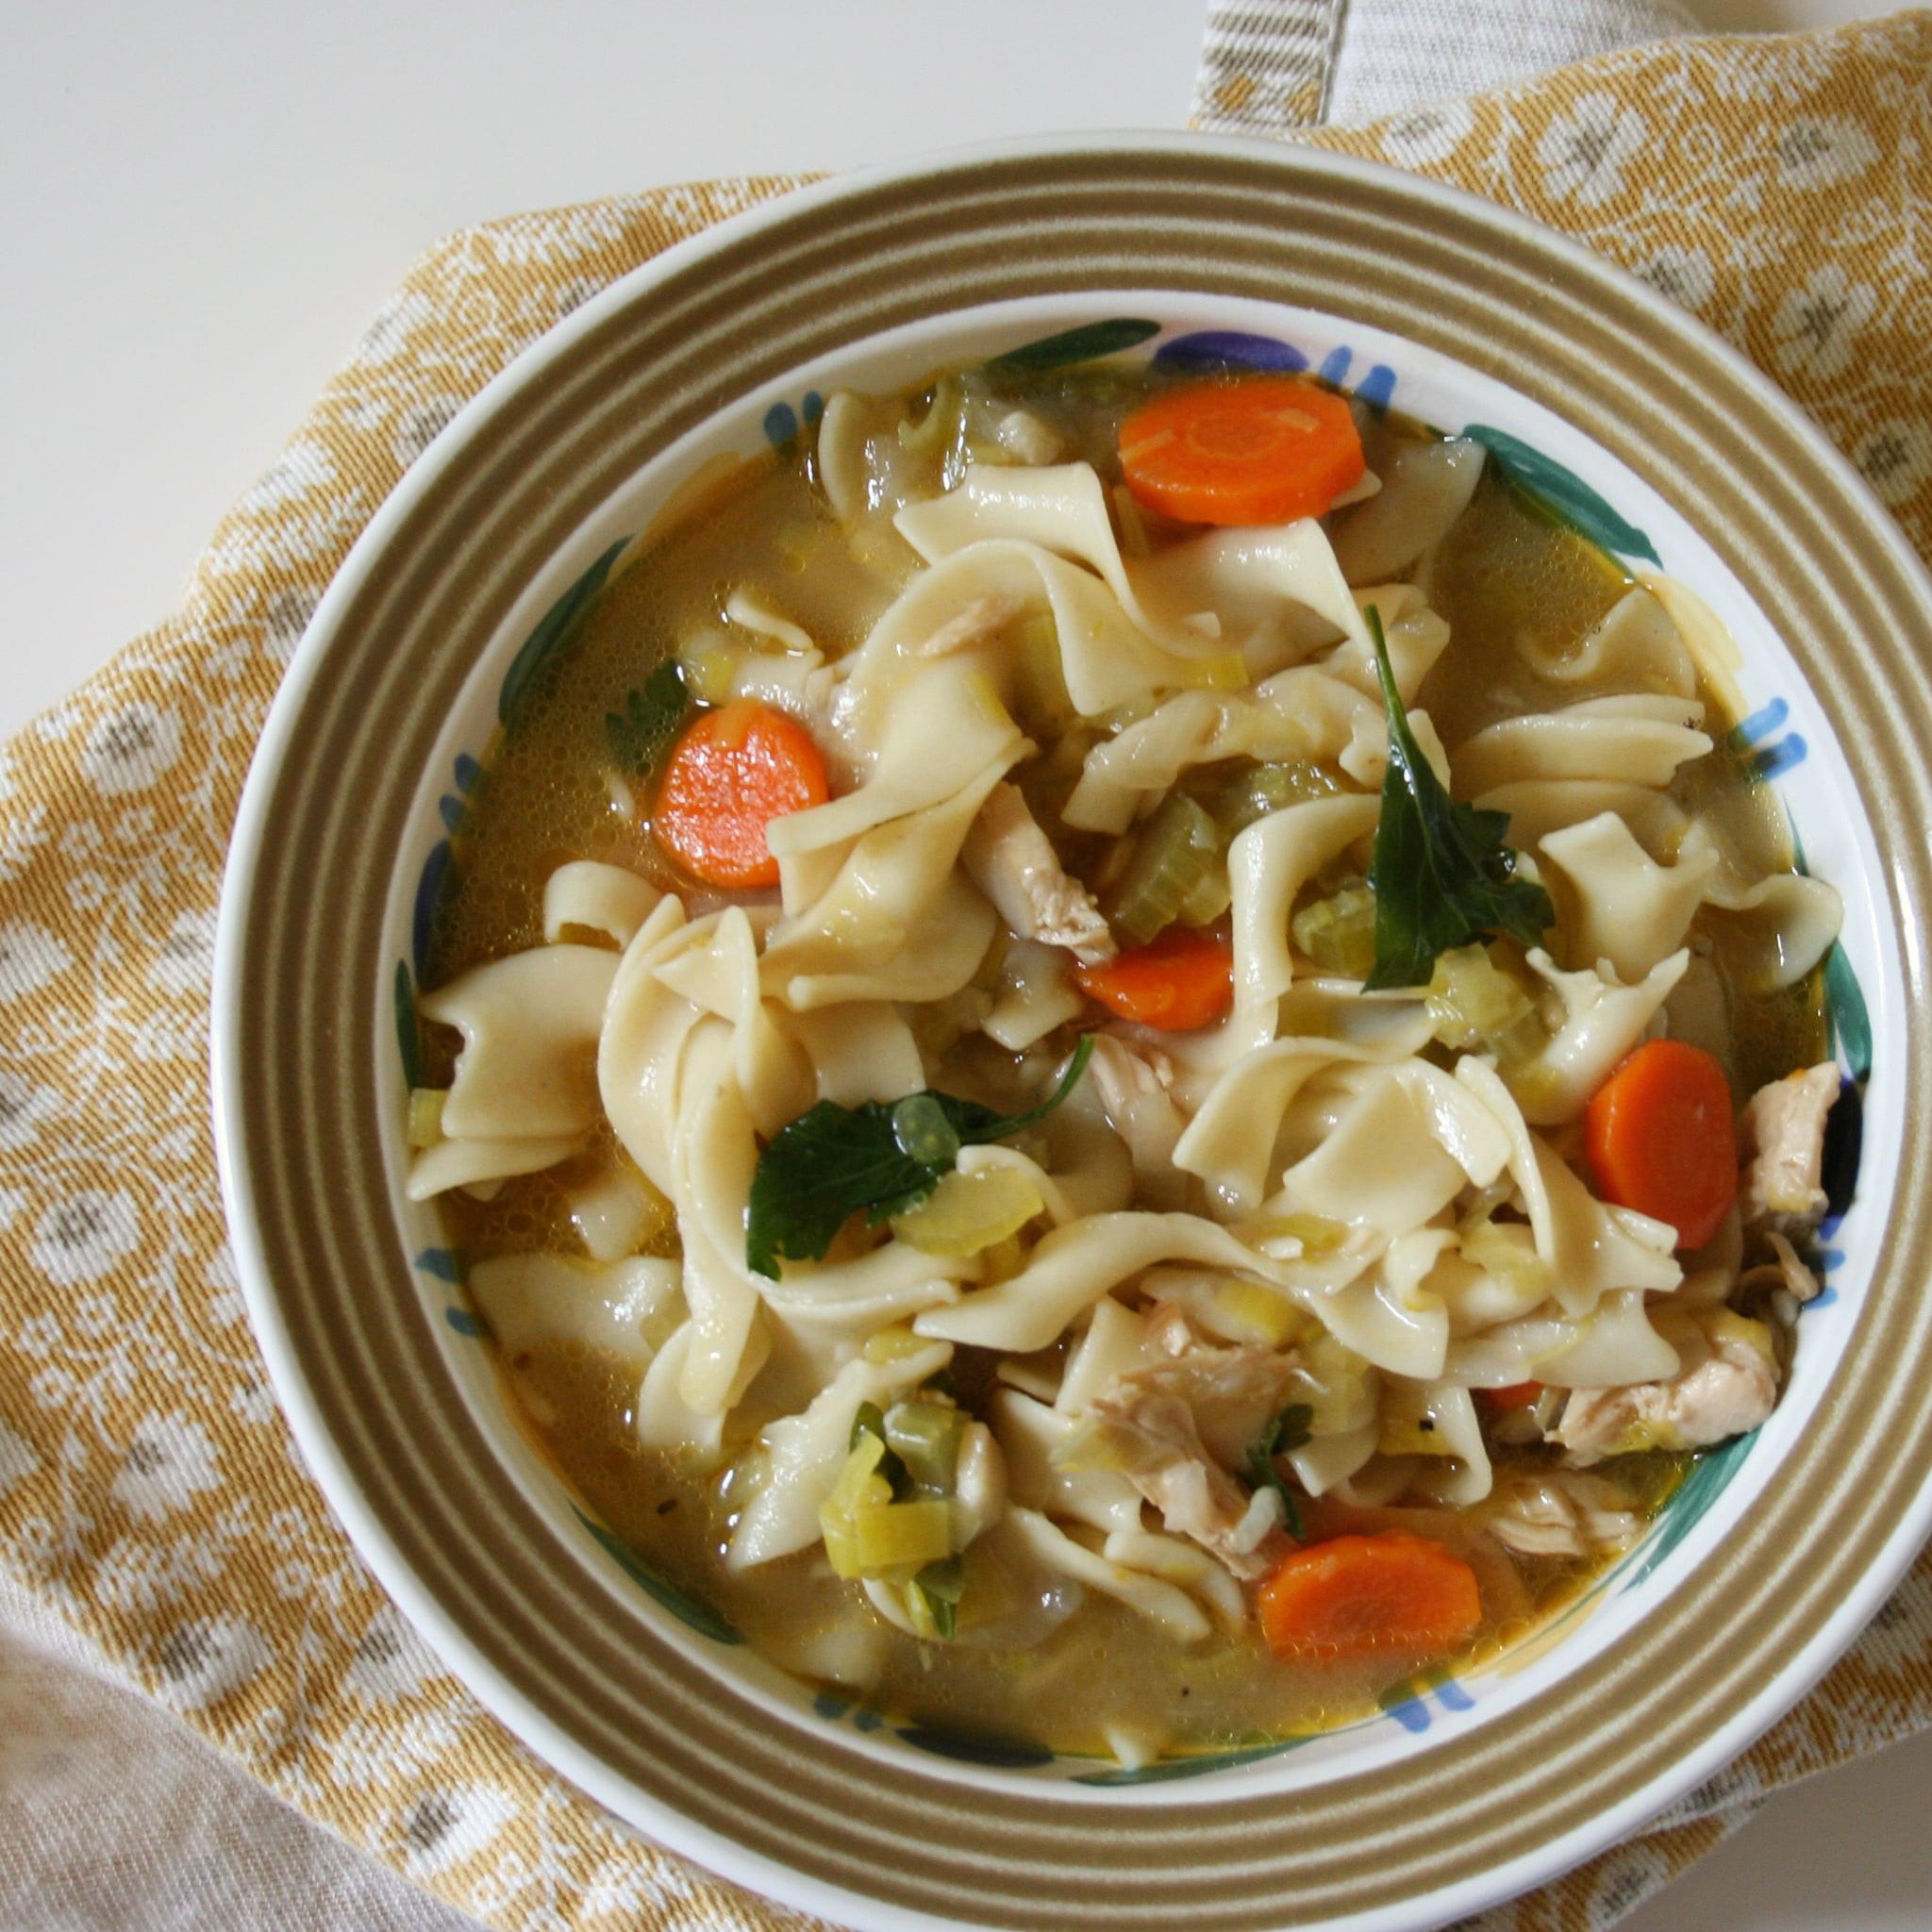 Chicken Noodles Recipe  Food Network Chicken Noodle Soup Recipes